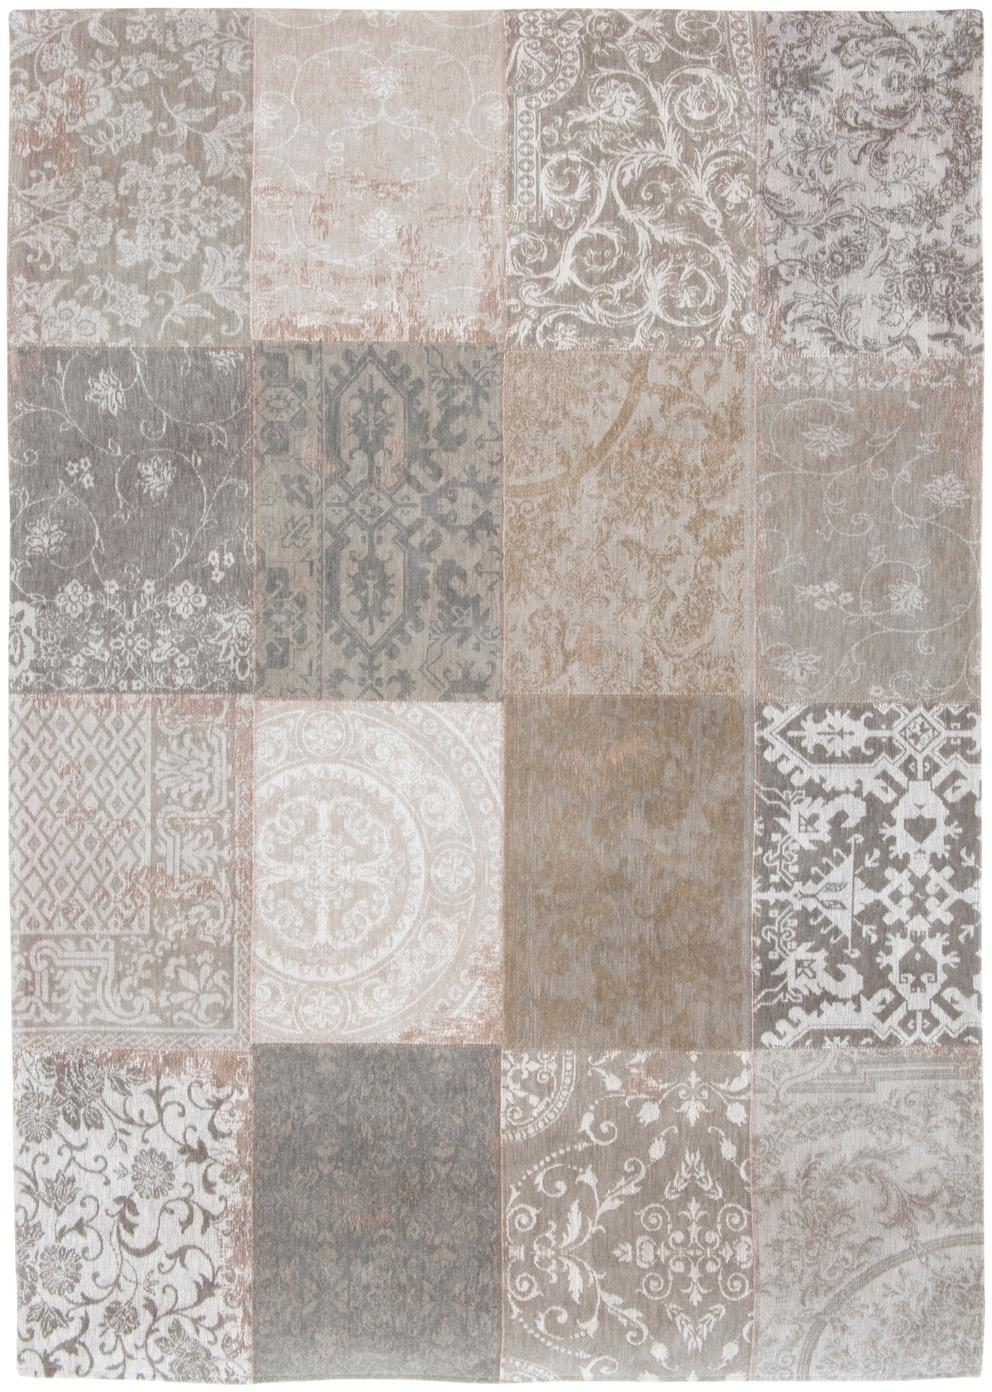 Alfombra de cheinilla Multi, Parte superior: 85%chenilla (algodón), 1, Reverso: mezcla de algodón, recubi, Beige, gris, An 170 x L 240 cm (Tamaño M)